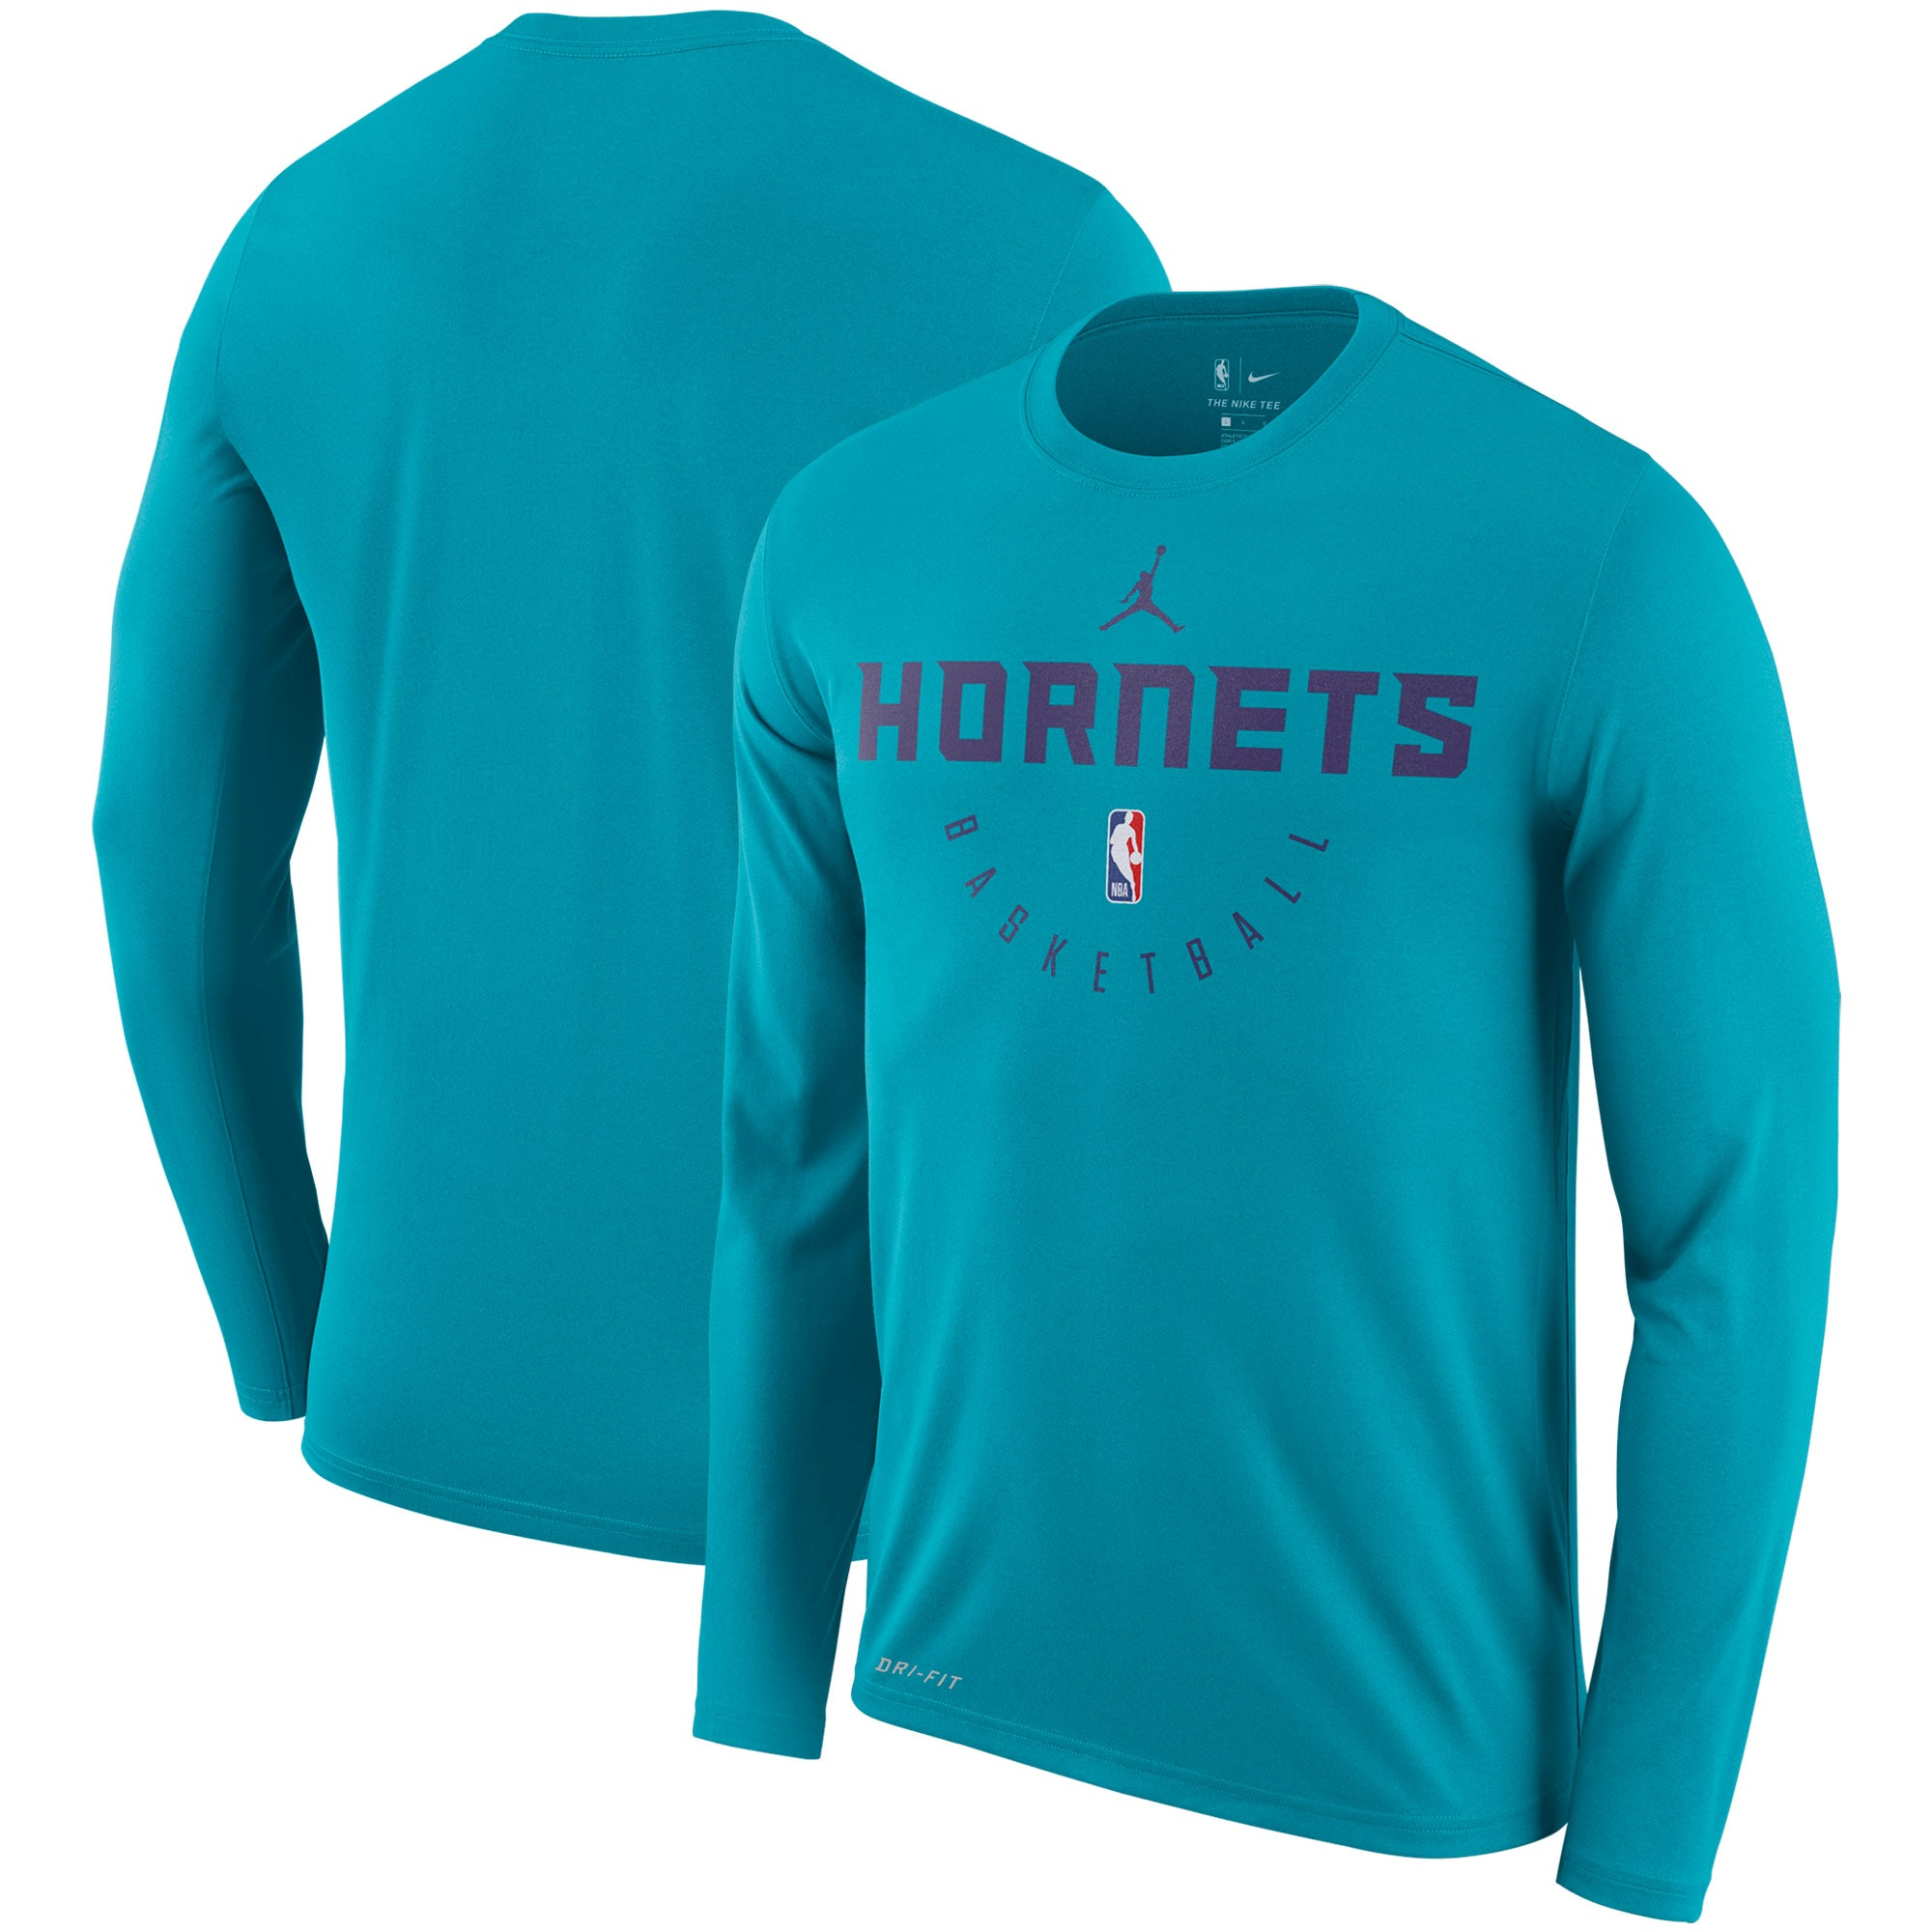 Charlotte Hornets Jordan Brand Practice Performance Legend Long Sleeve T-Shirt - Teal